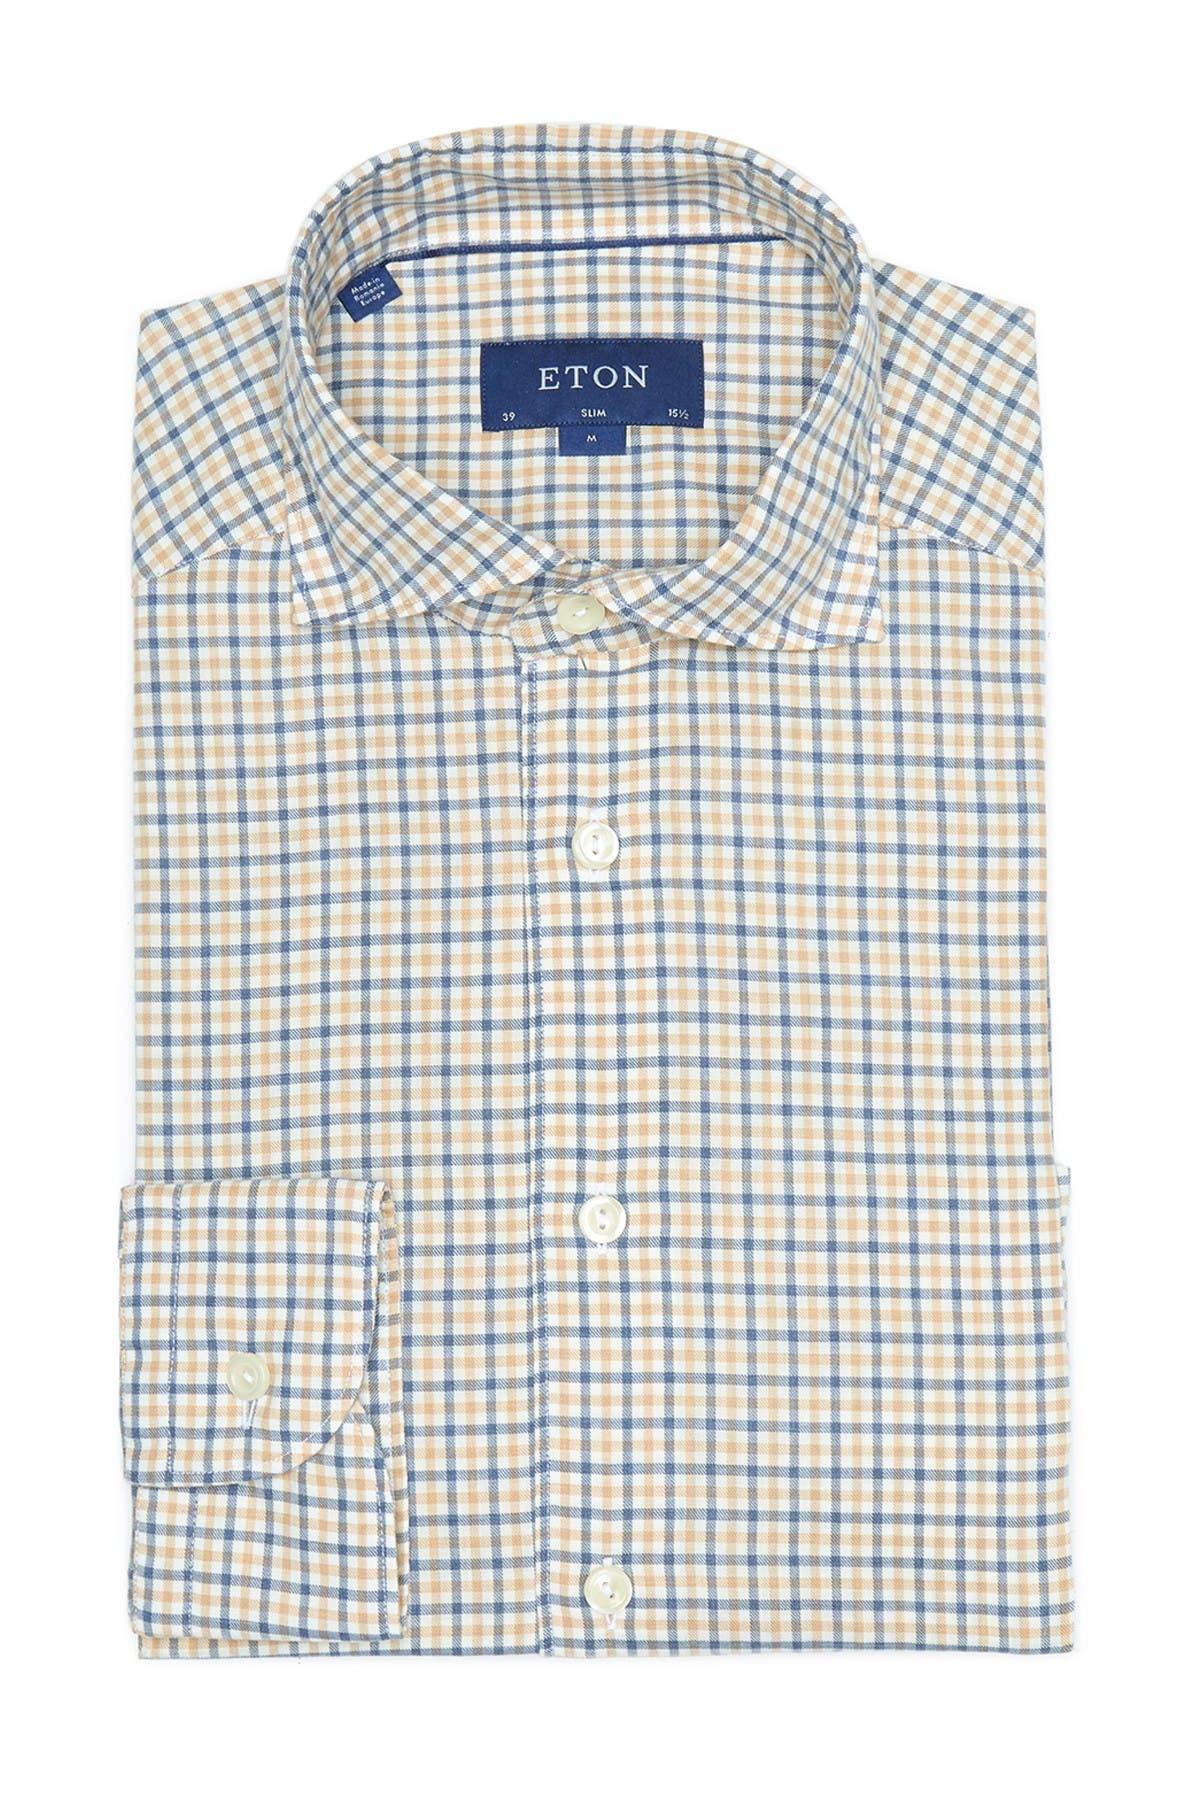 Image of Eton Slim Fit Checker Shirt